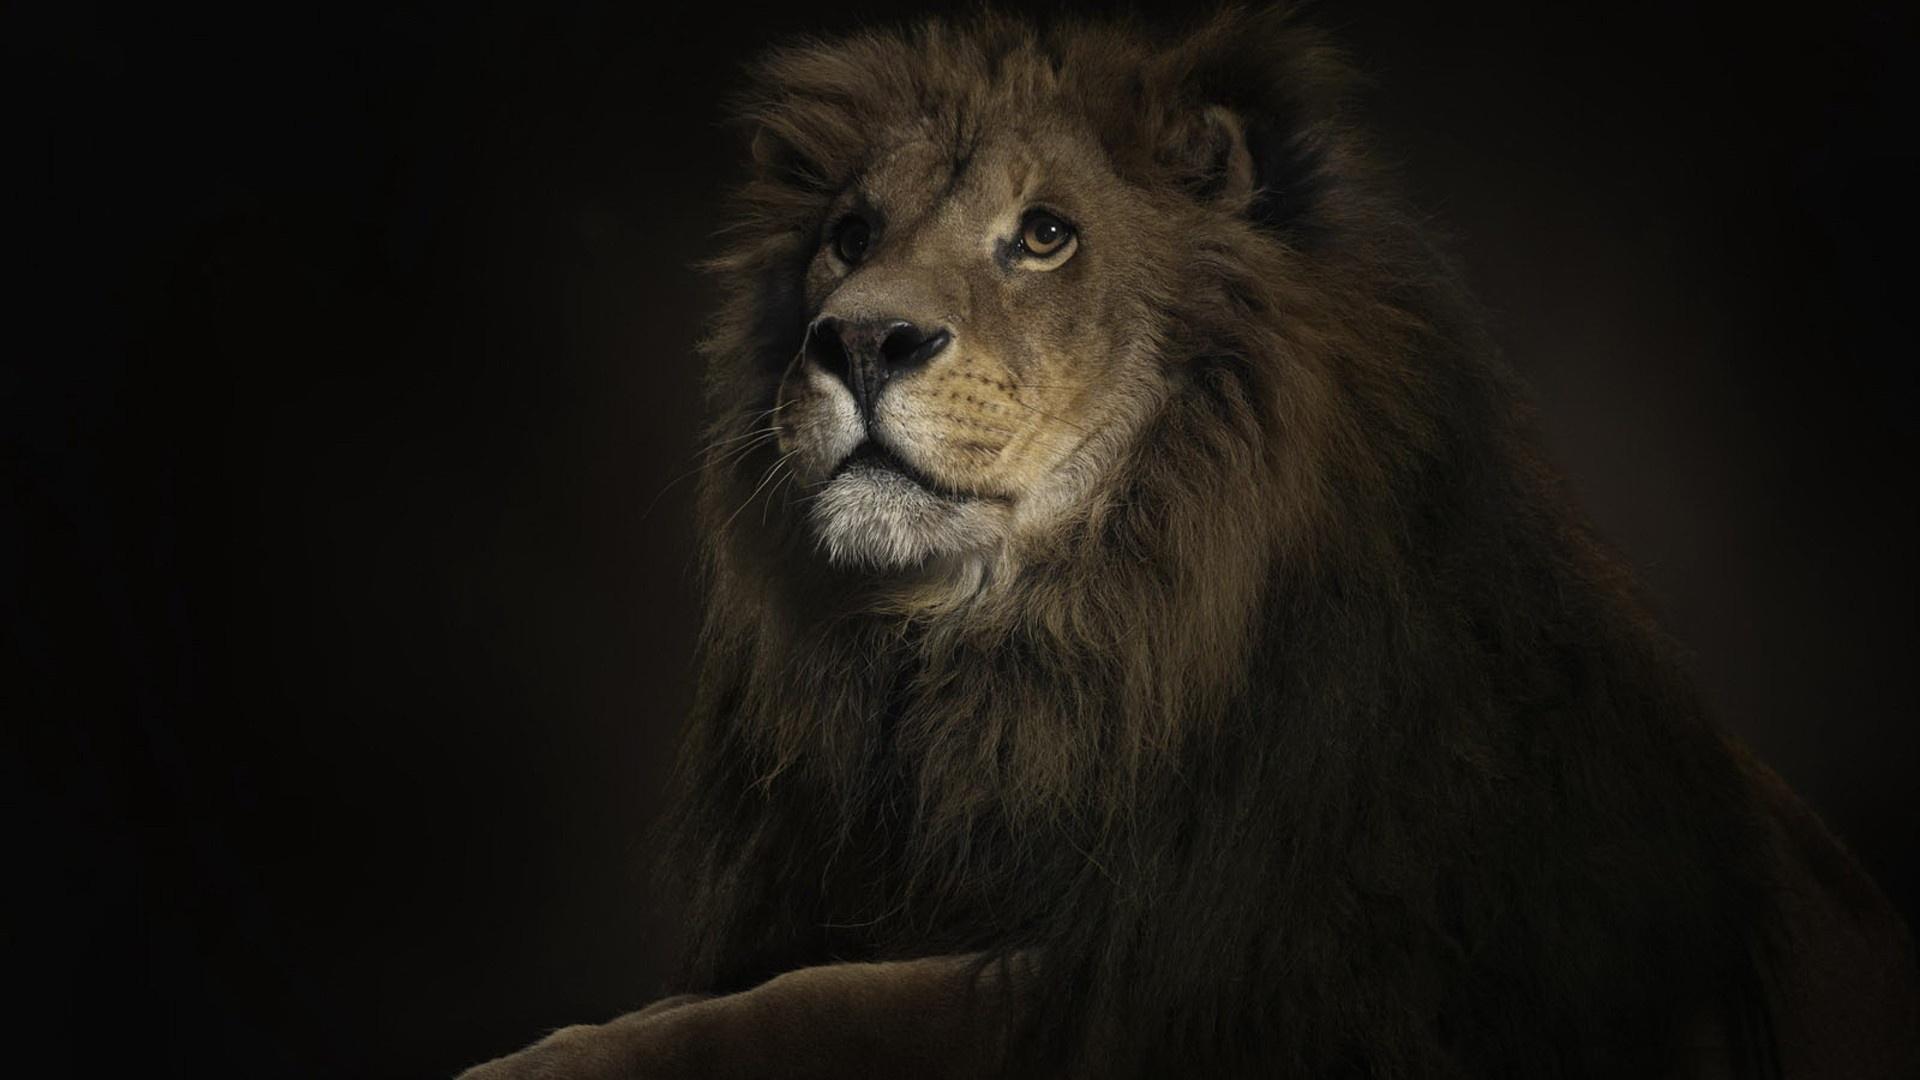 lion wallpaper desktop 64